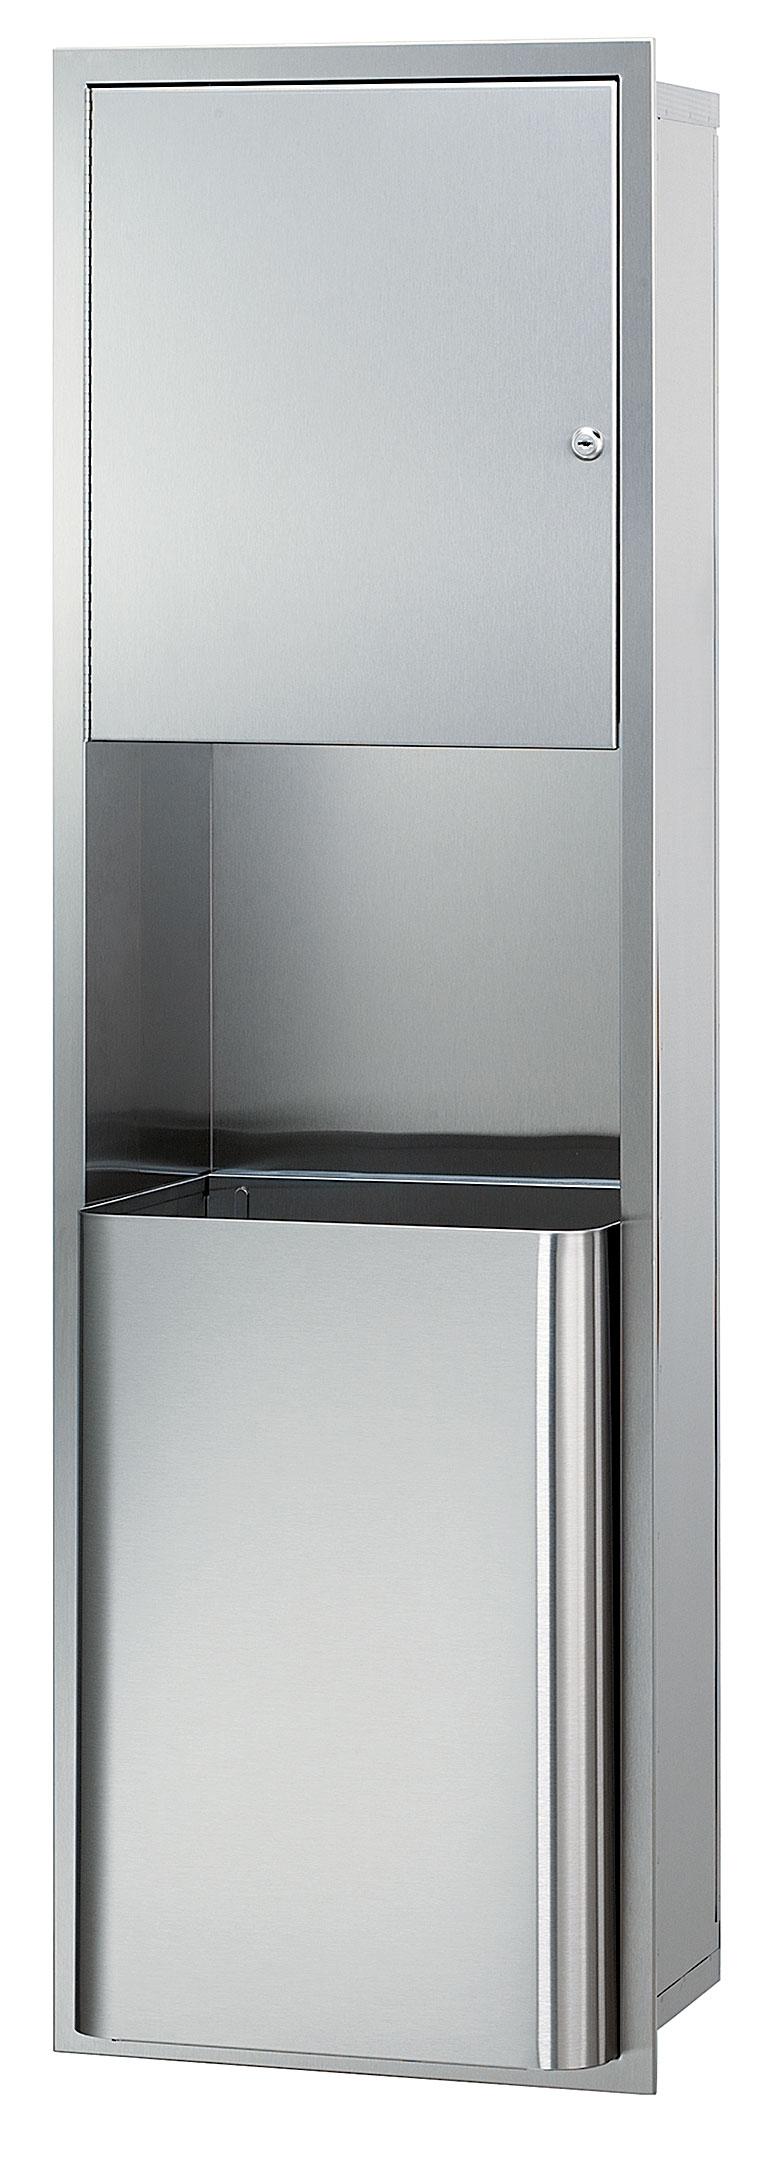 Bradley 2271-10 Semi-Recessed Towel Dispenser & 18 gal. Waste Receptacle (No Dispenser)